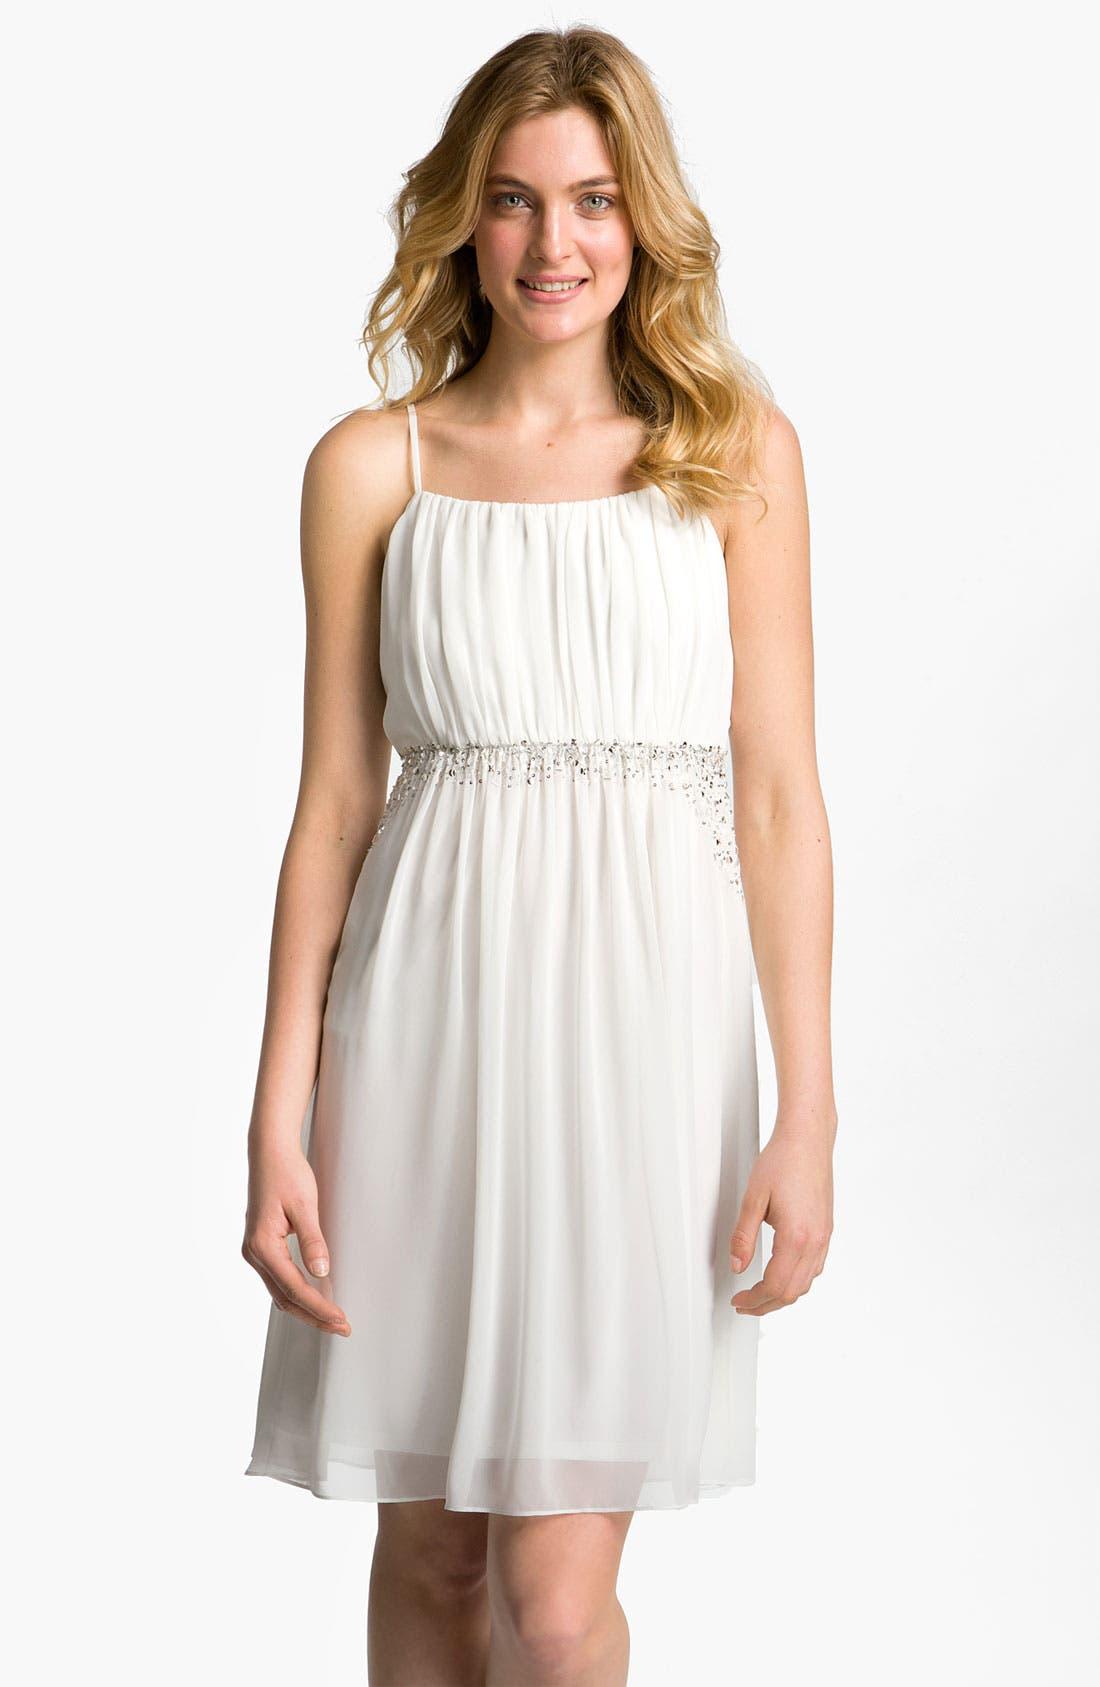 Alternate Image 1 Selected - Calvin Klein Embellished Chiffon Dress